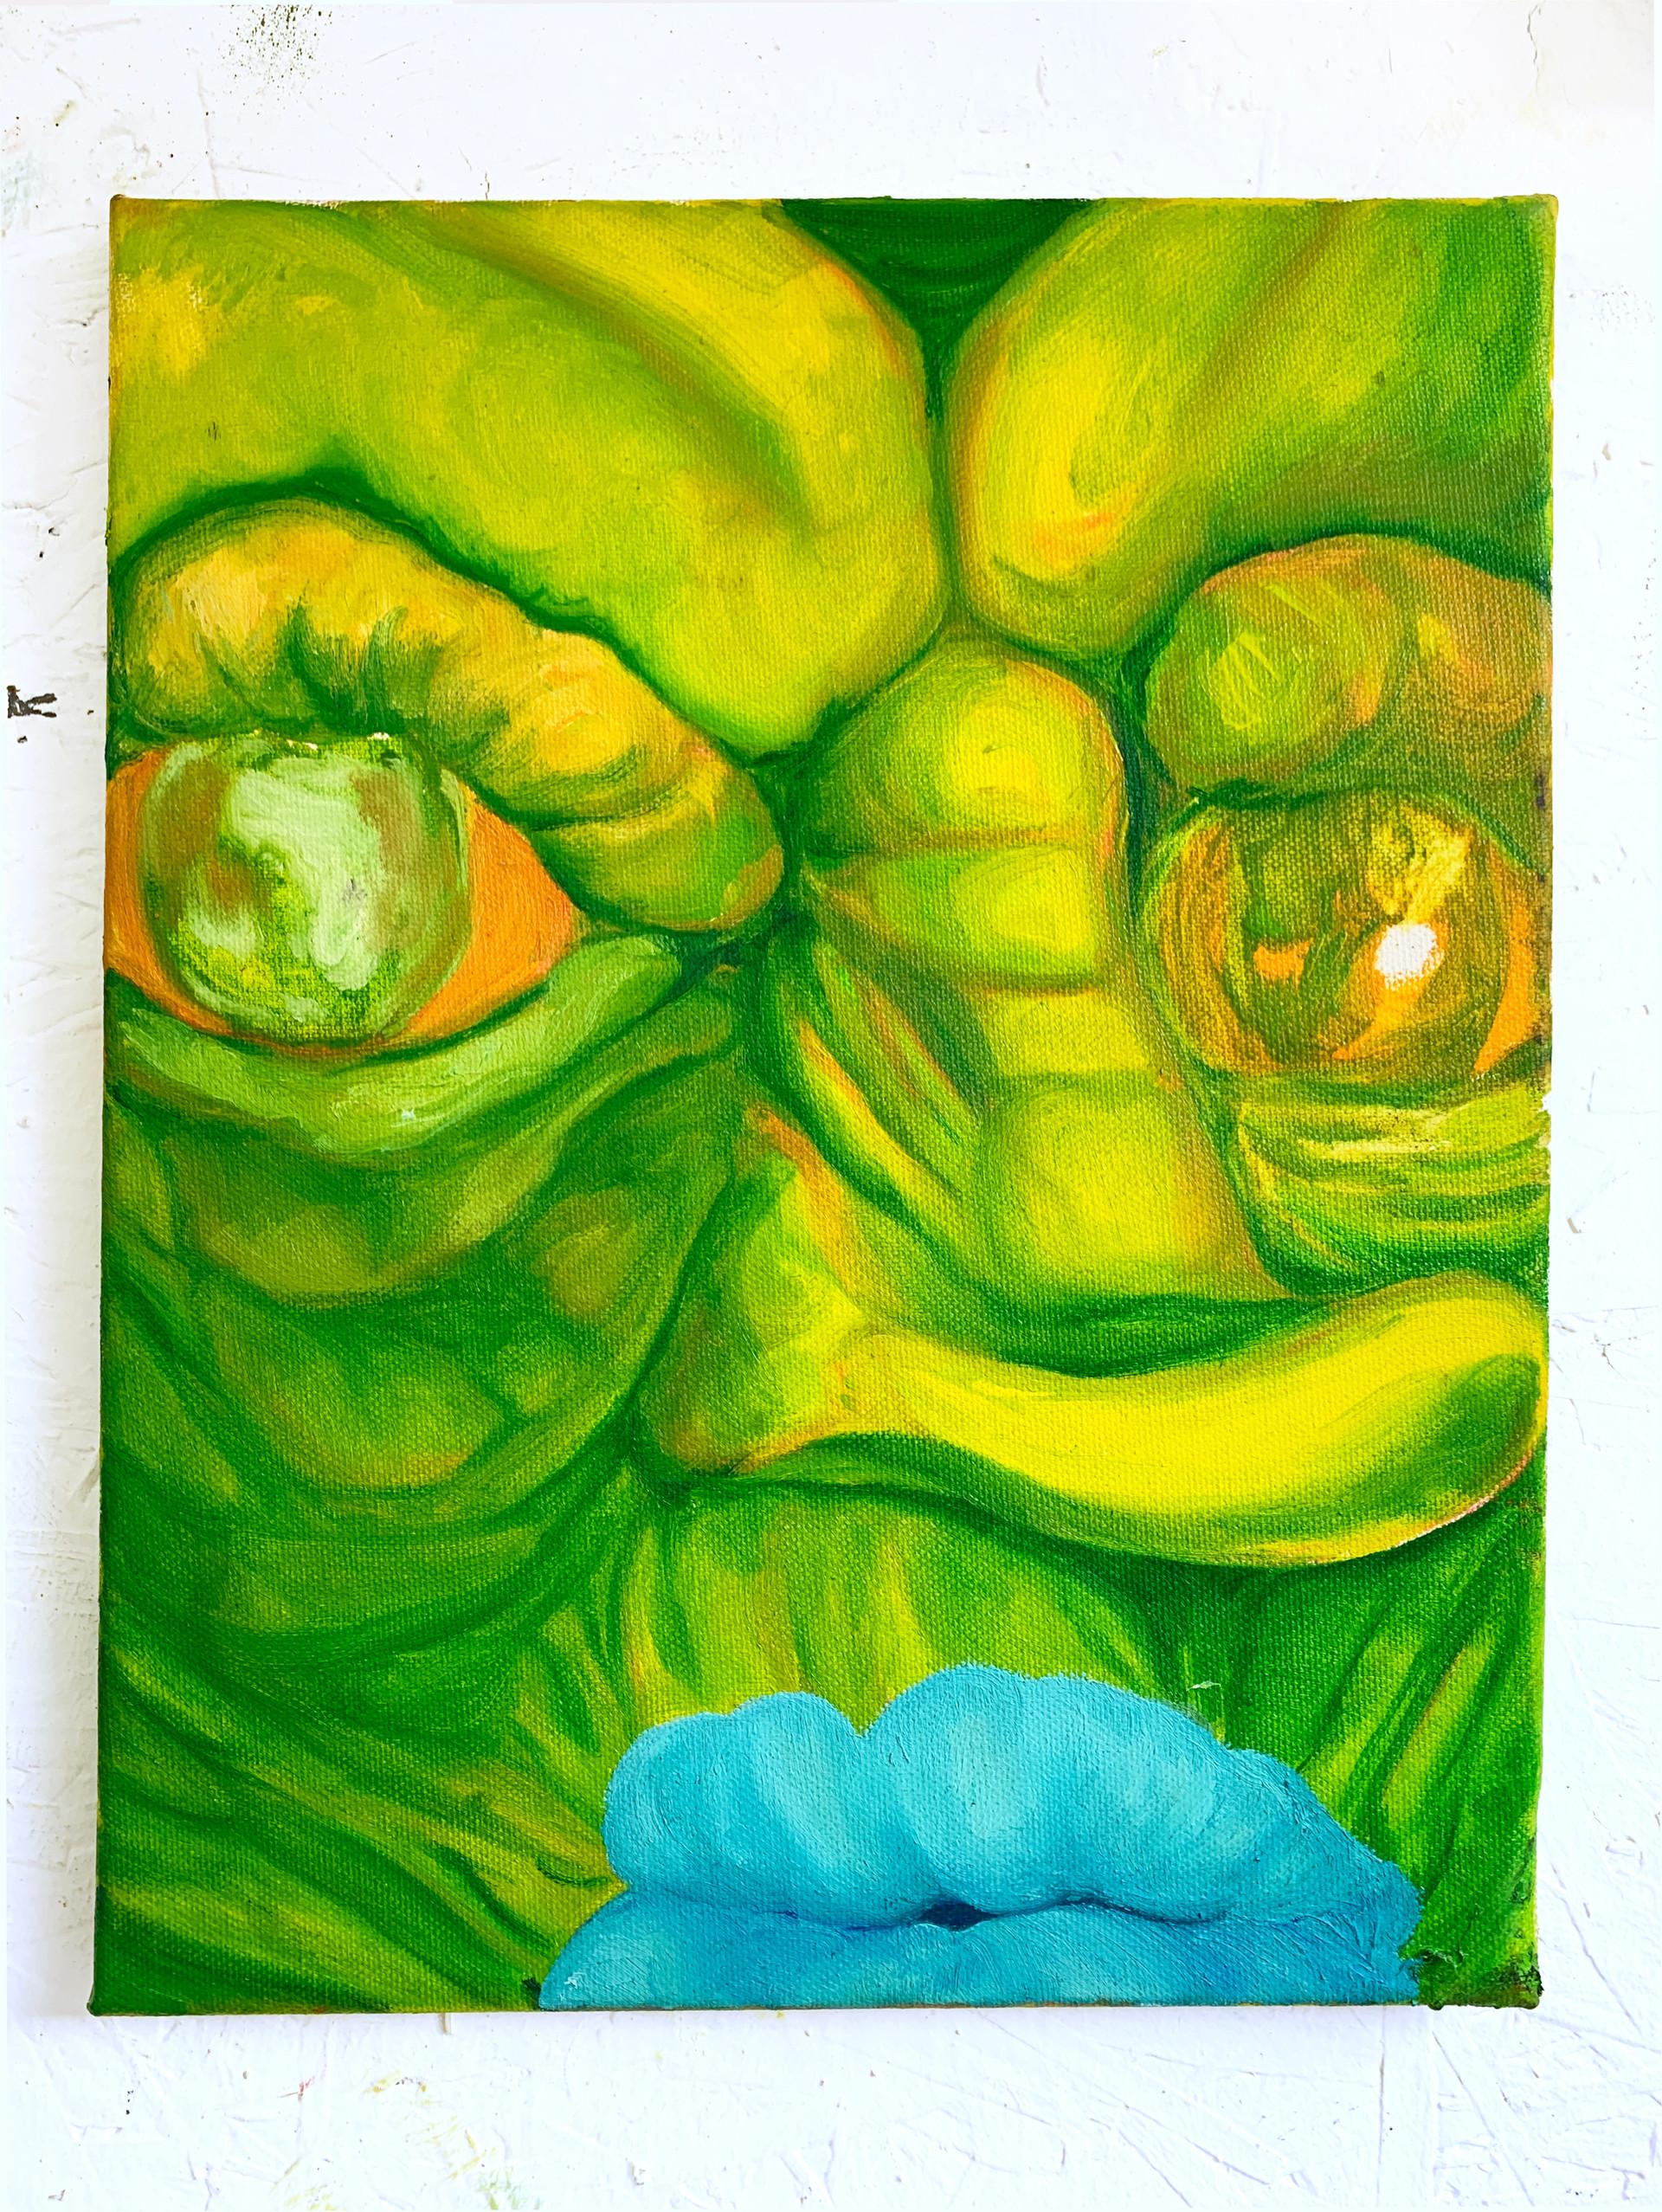 2020, 28x35cm, Oil, Canvas